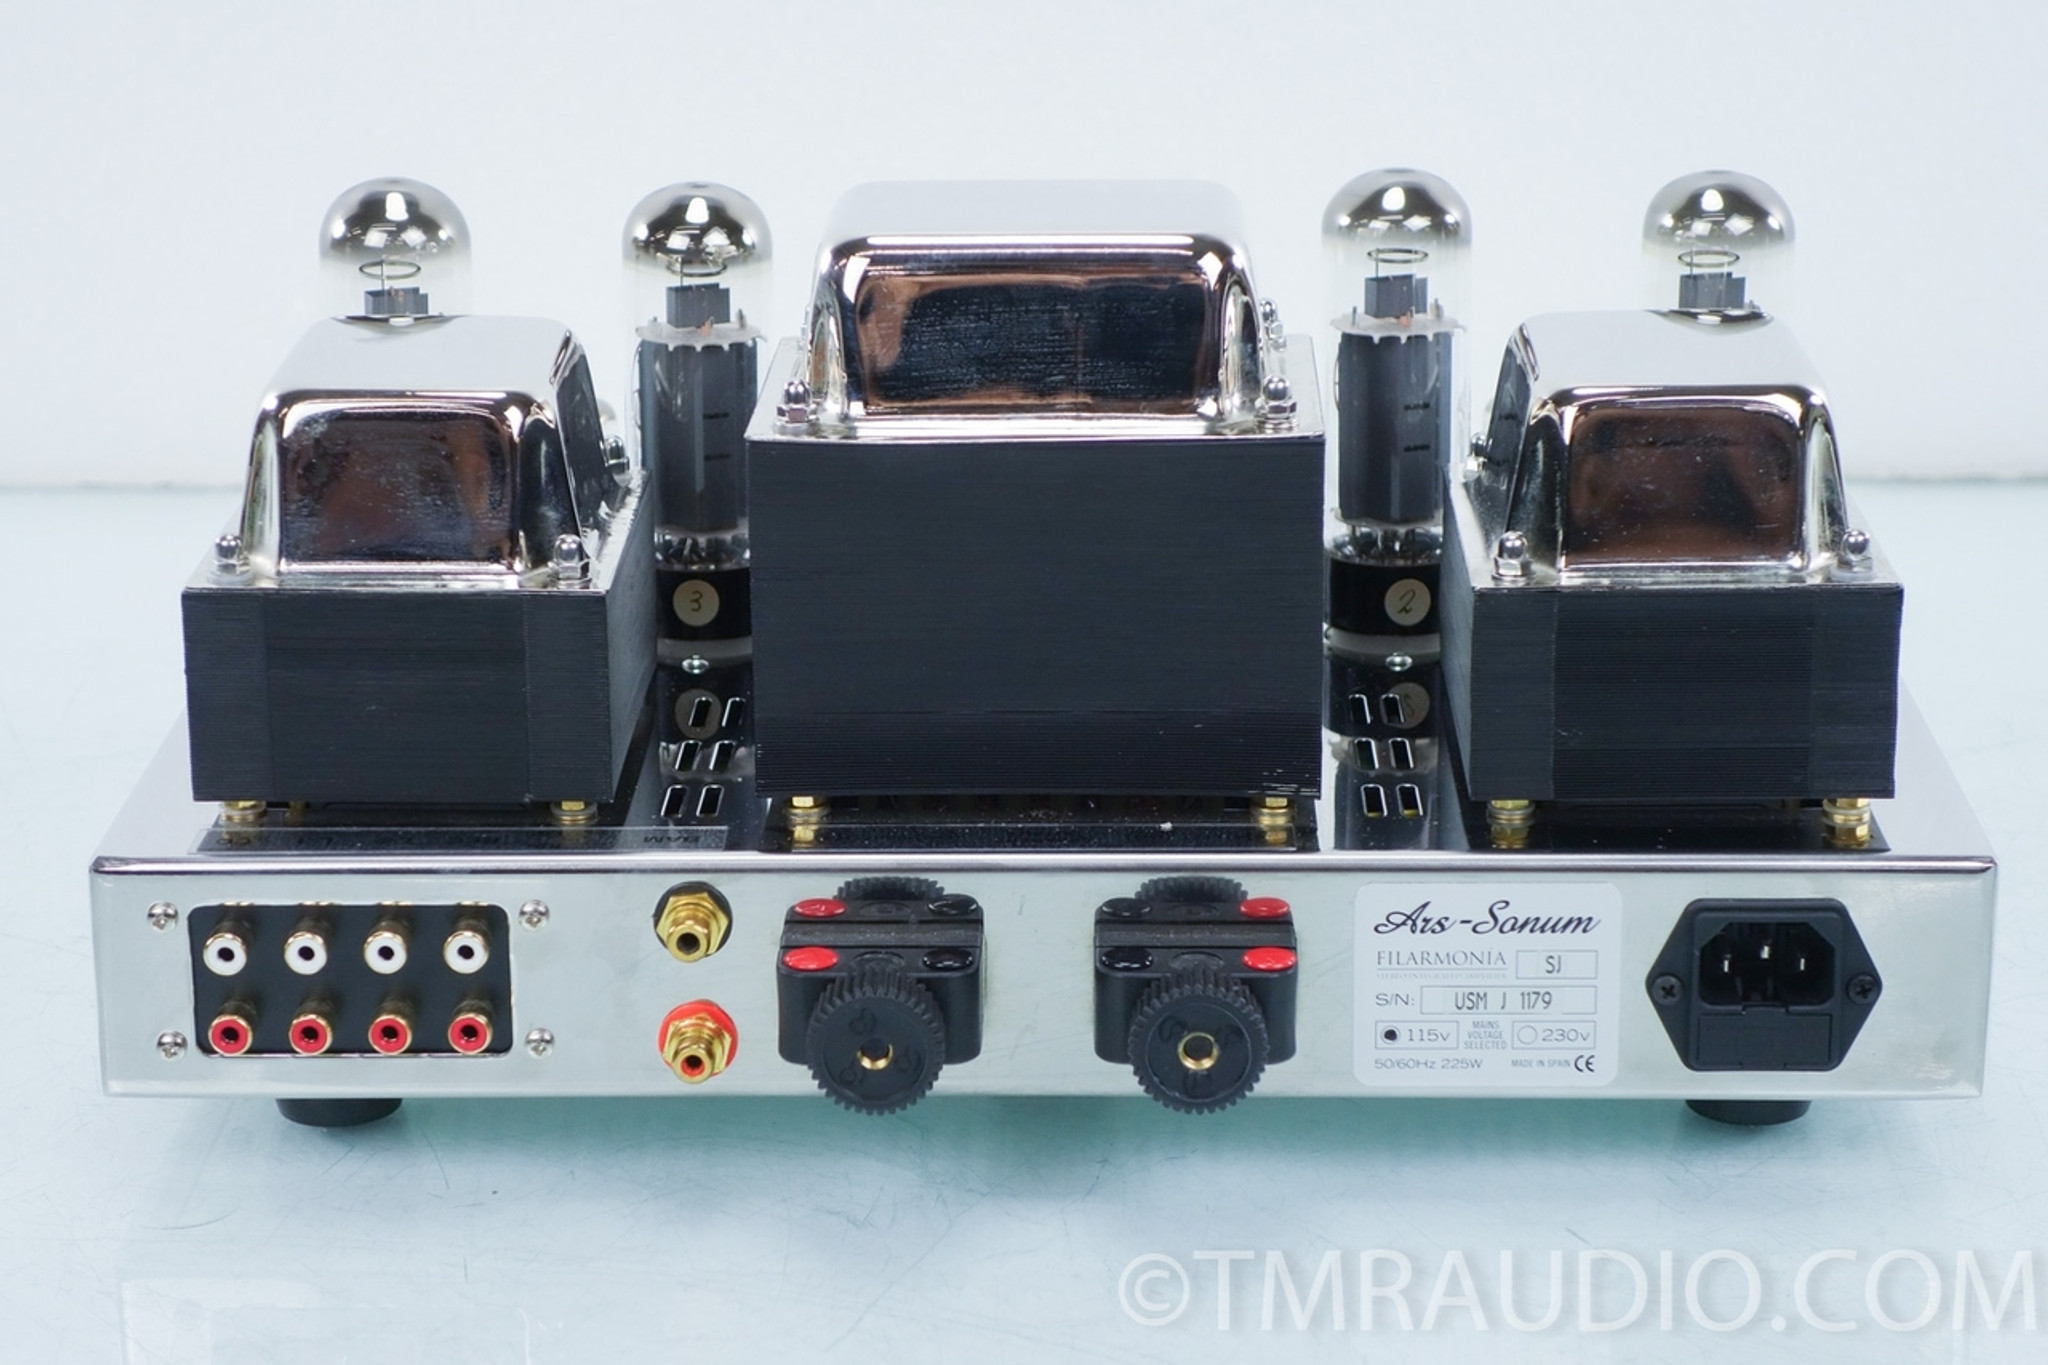 Ars-Sonum Filarmonia SJ Tube Integrated Amplifier